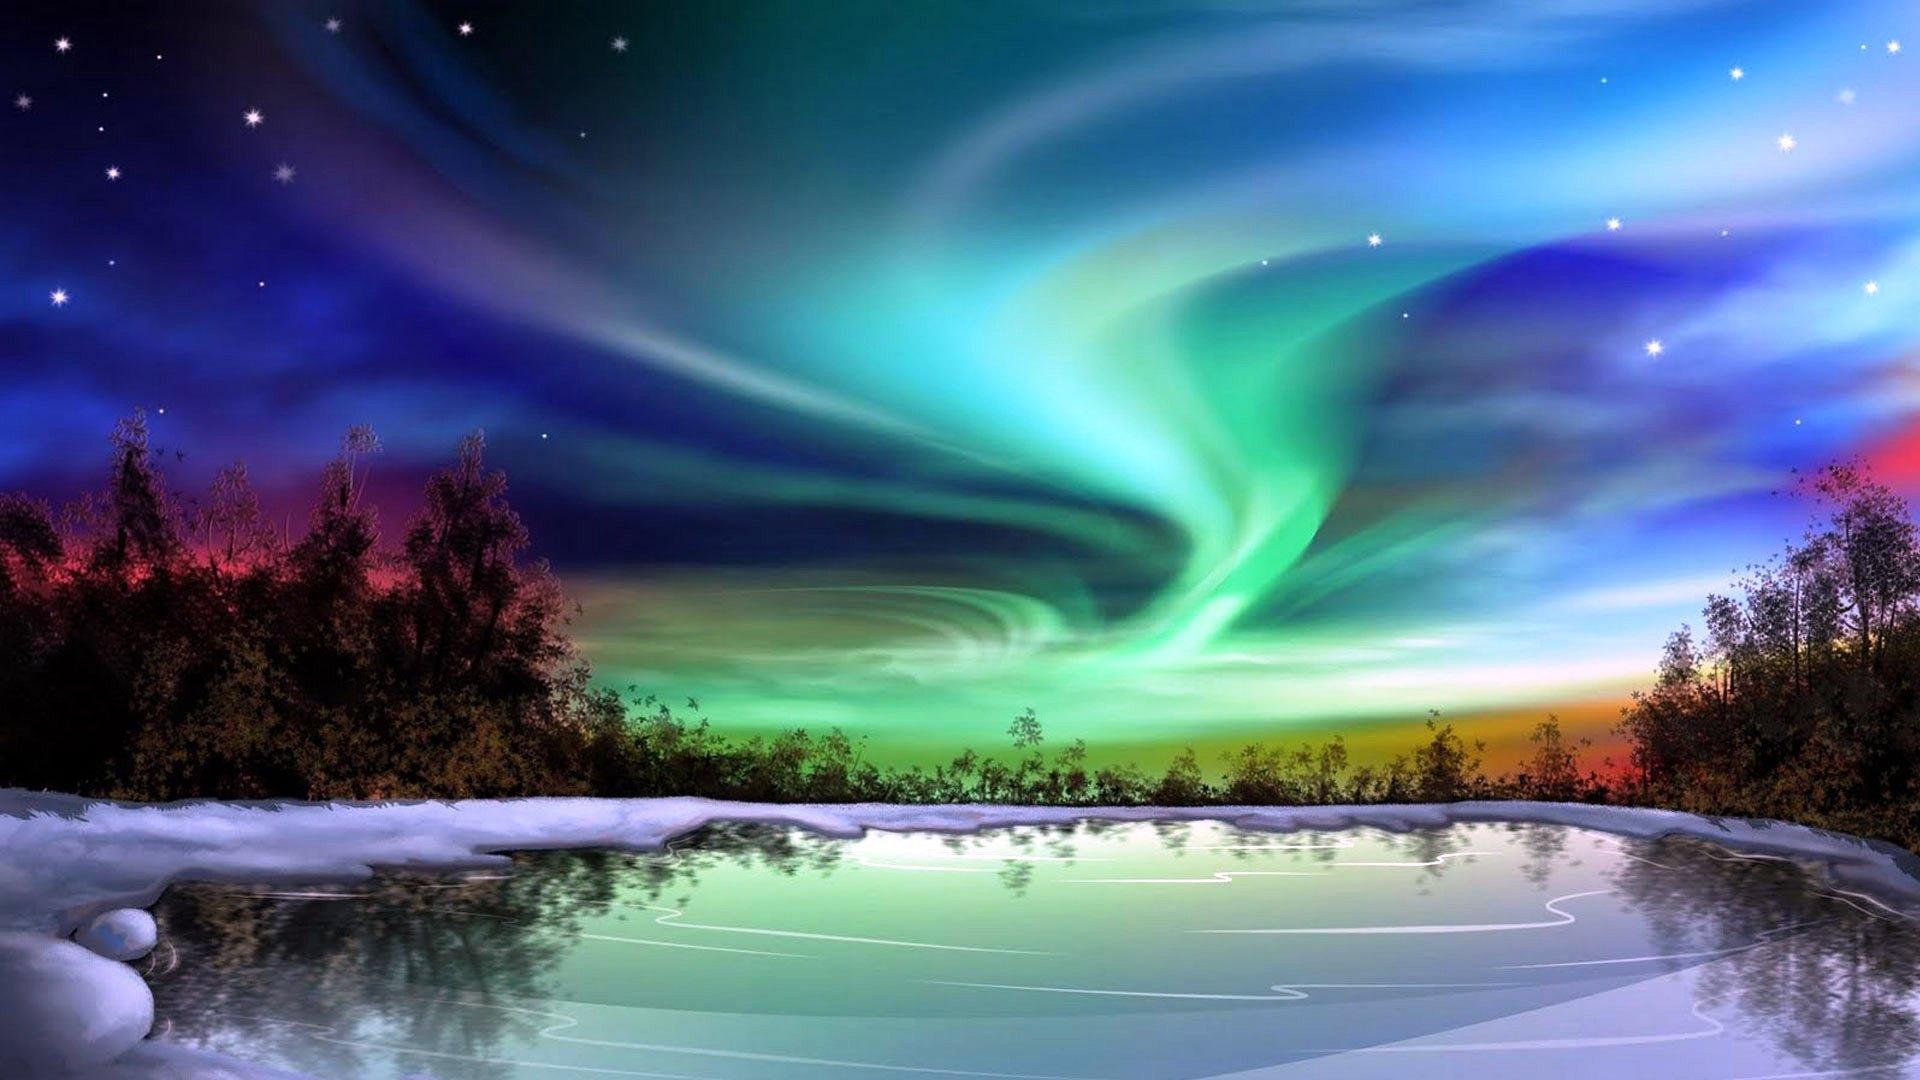 aurora borealis nature - photo #22